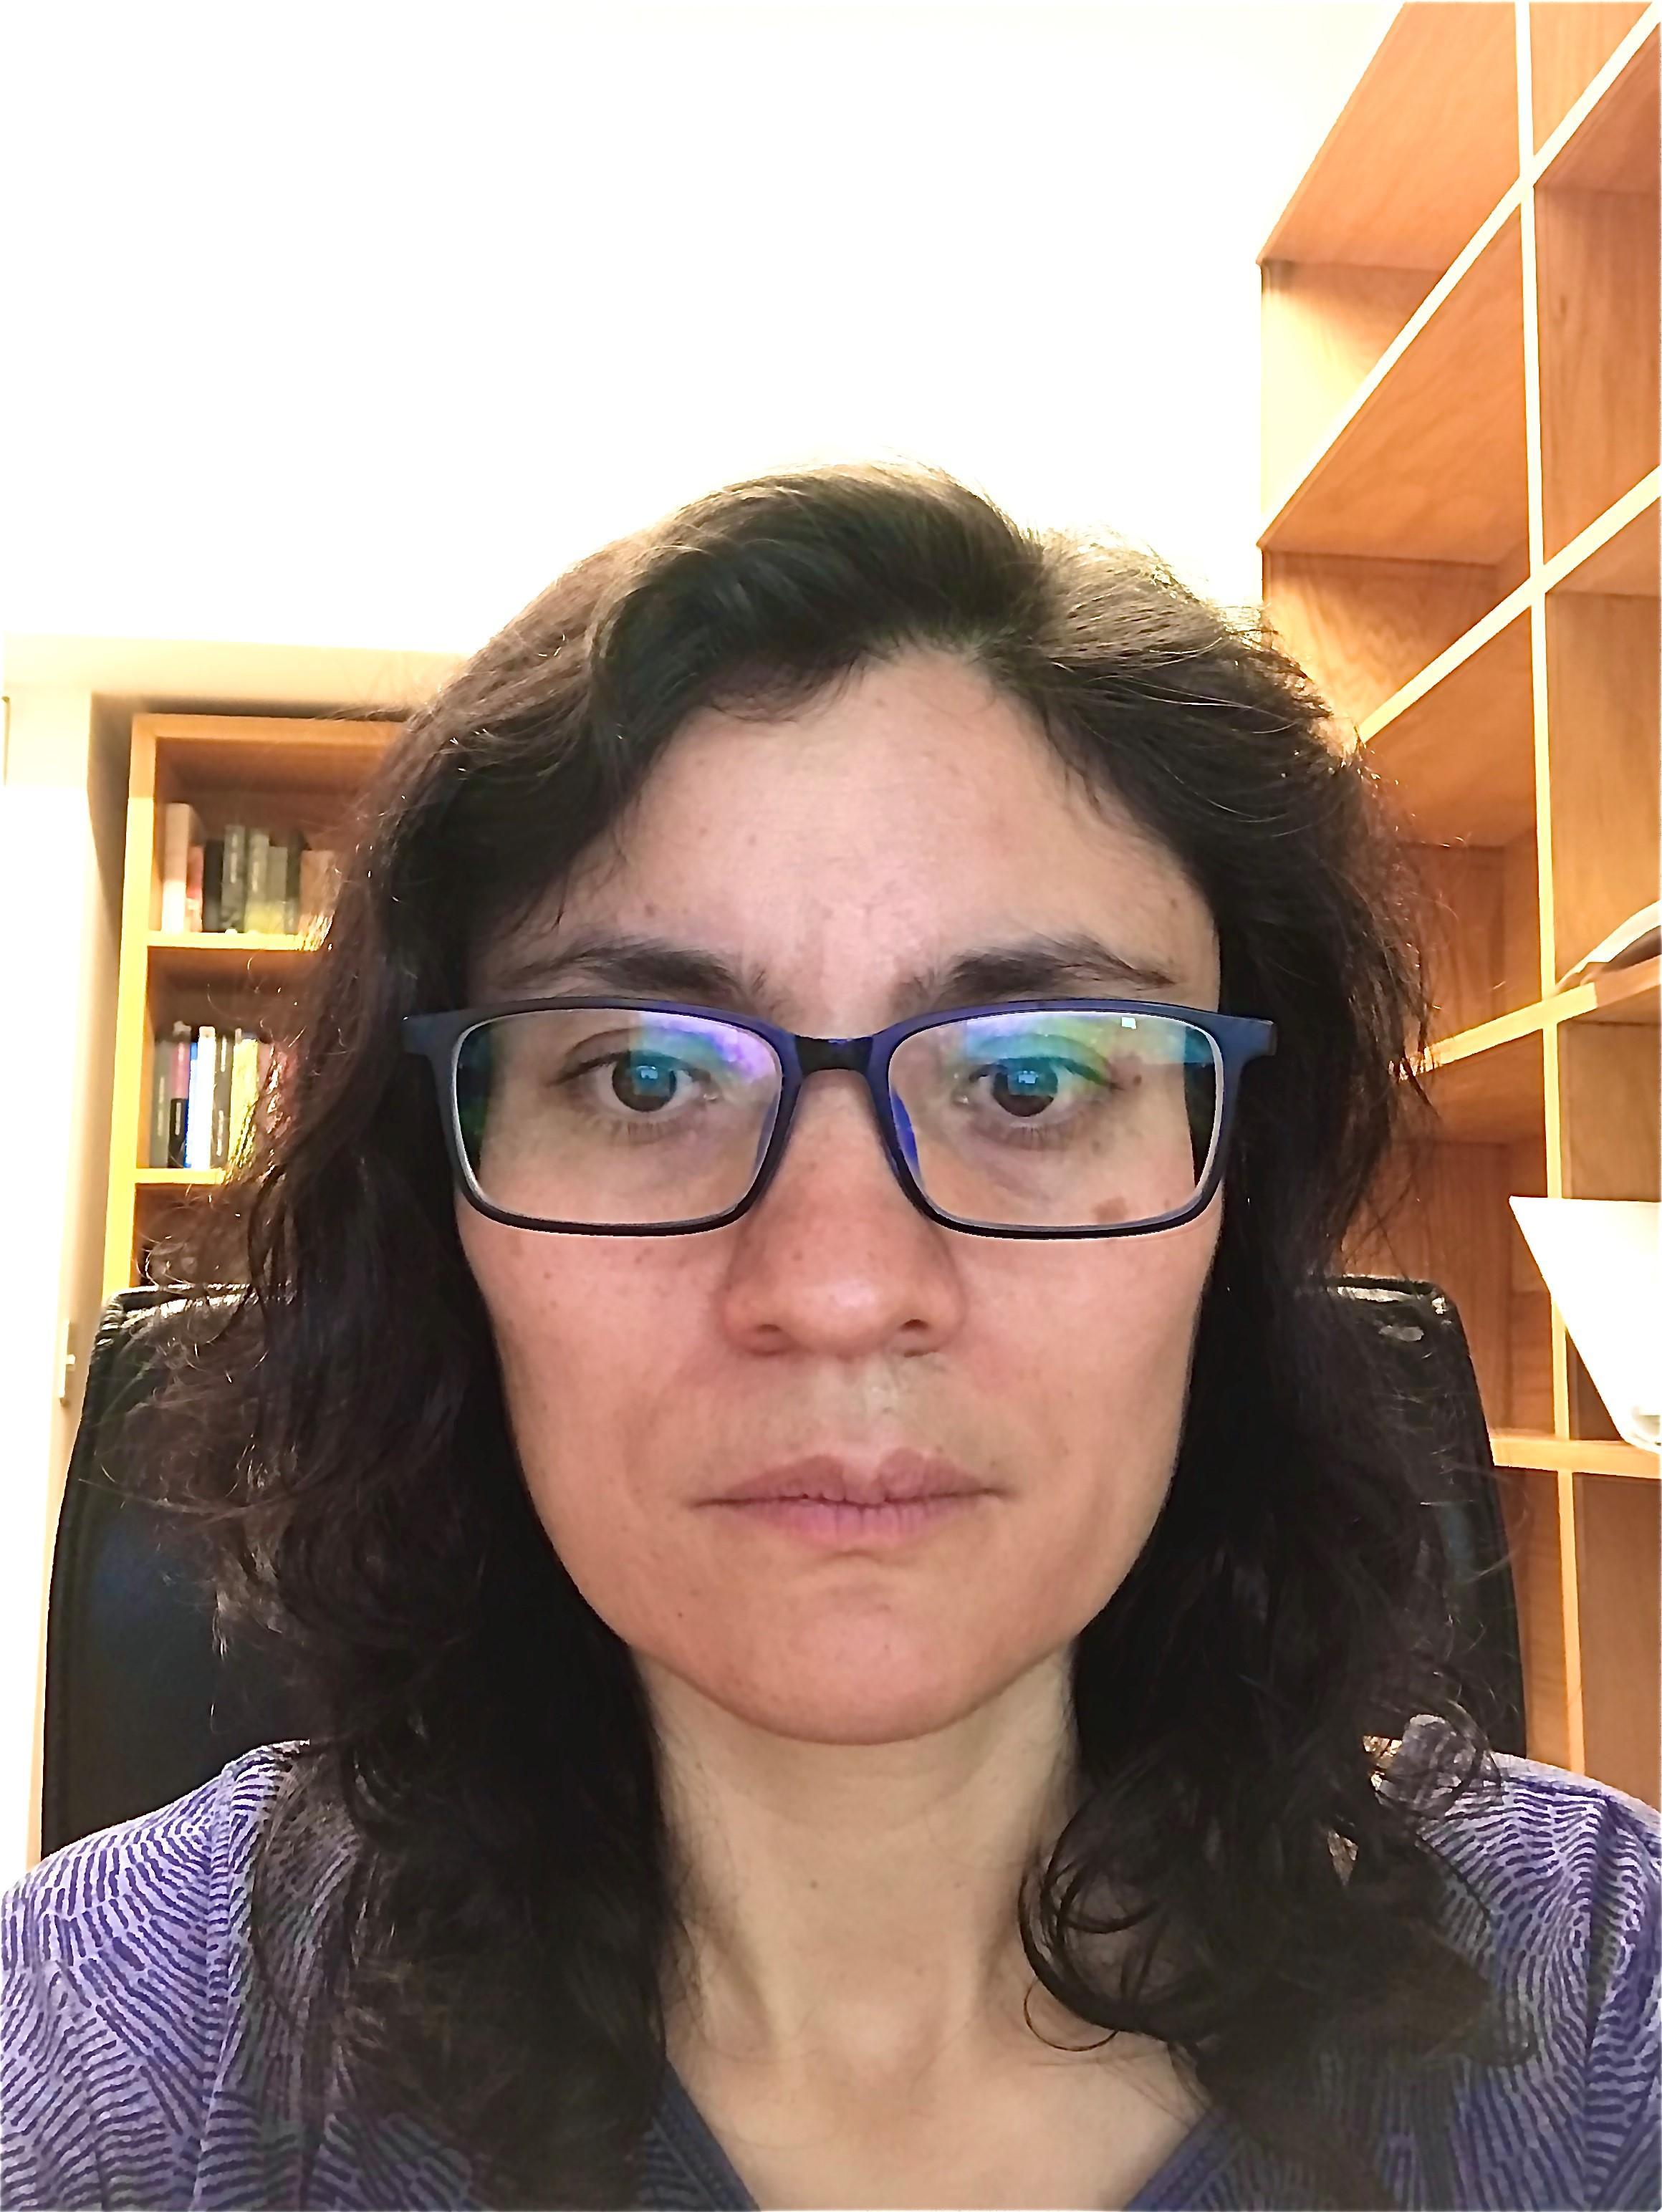 Anabel Alejandra Soledad Jiménez Tovar